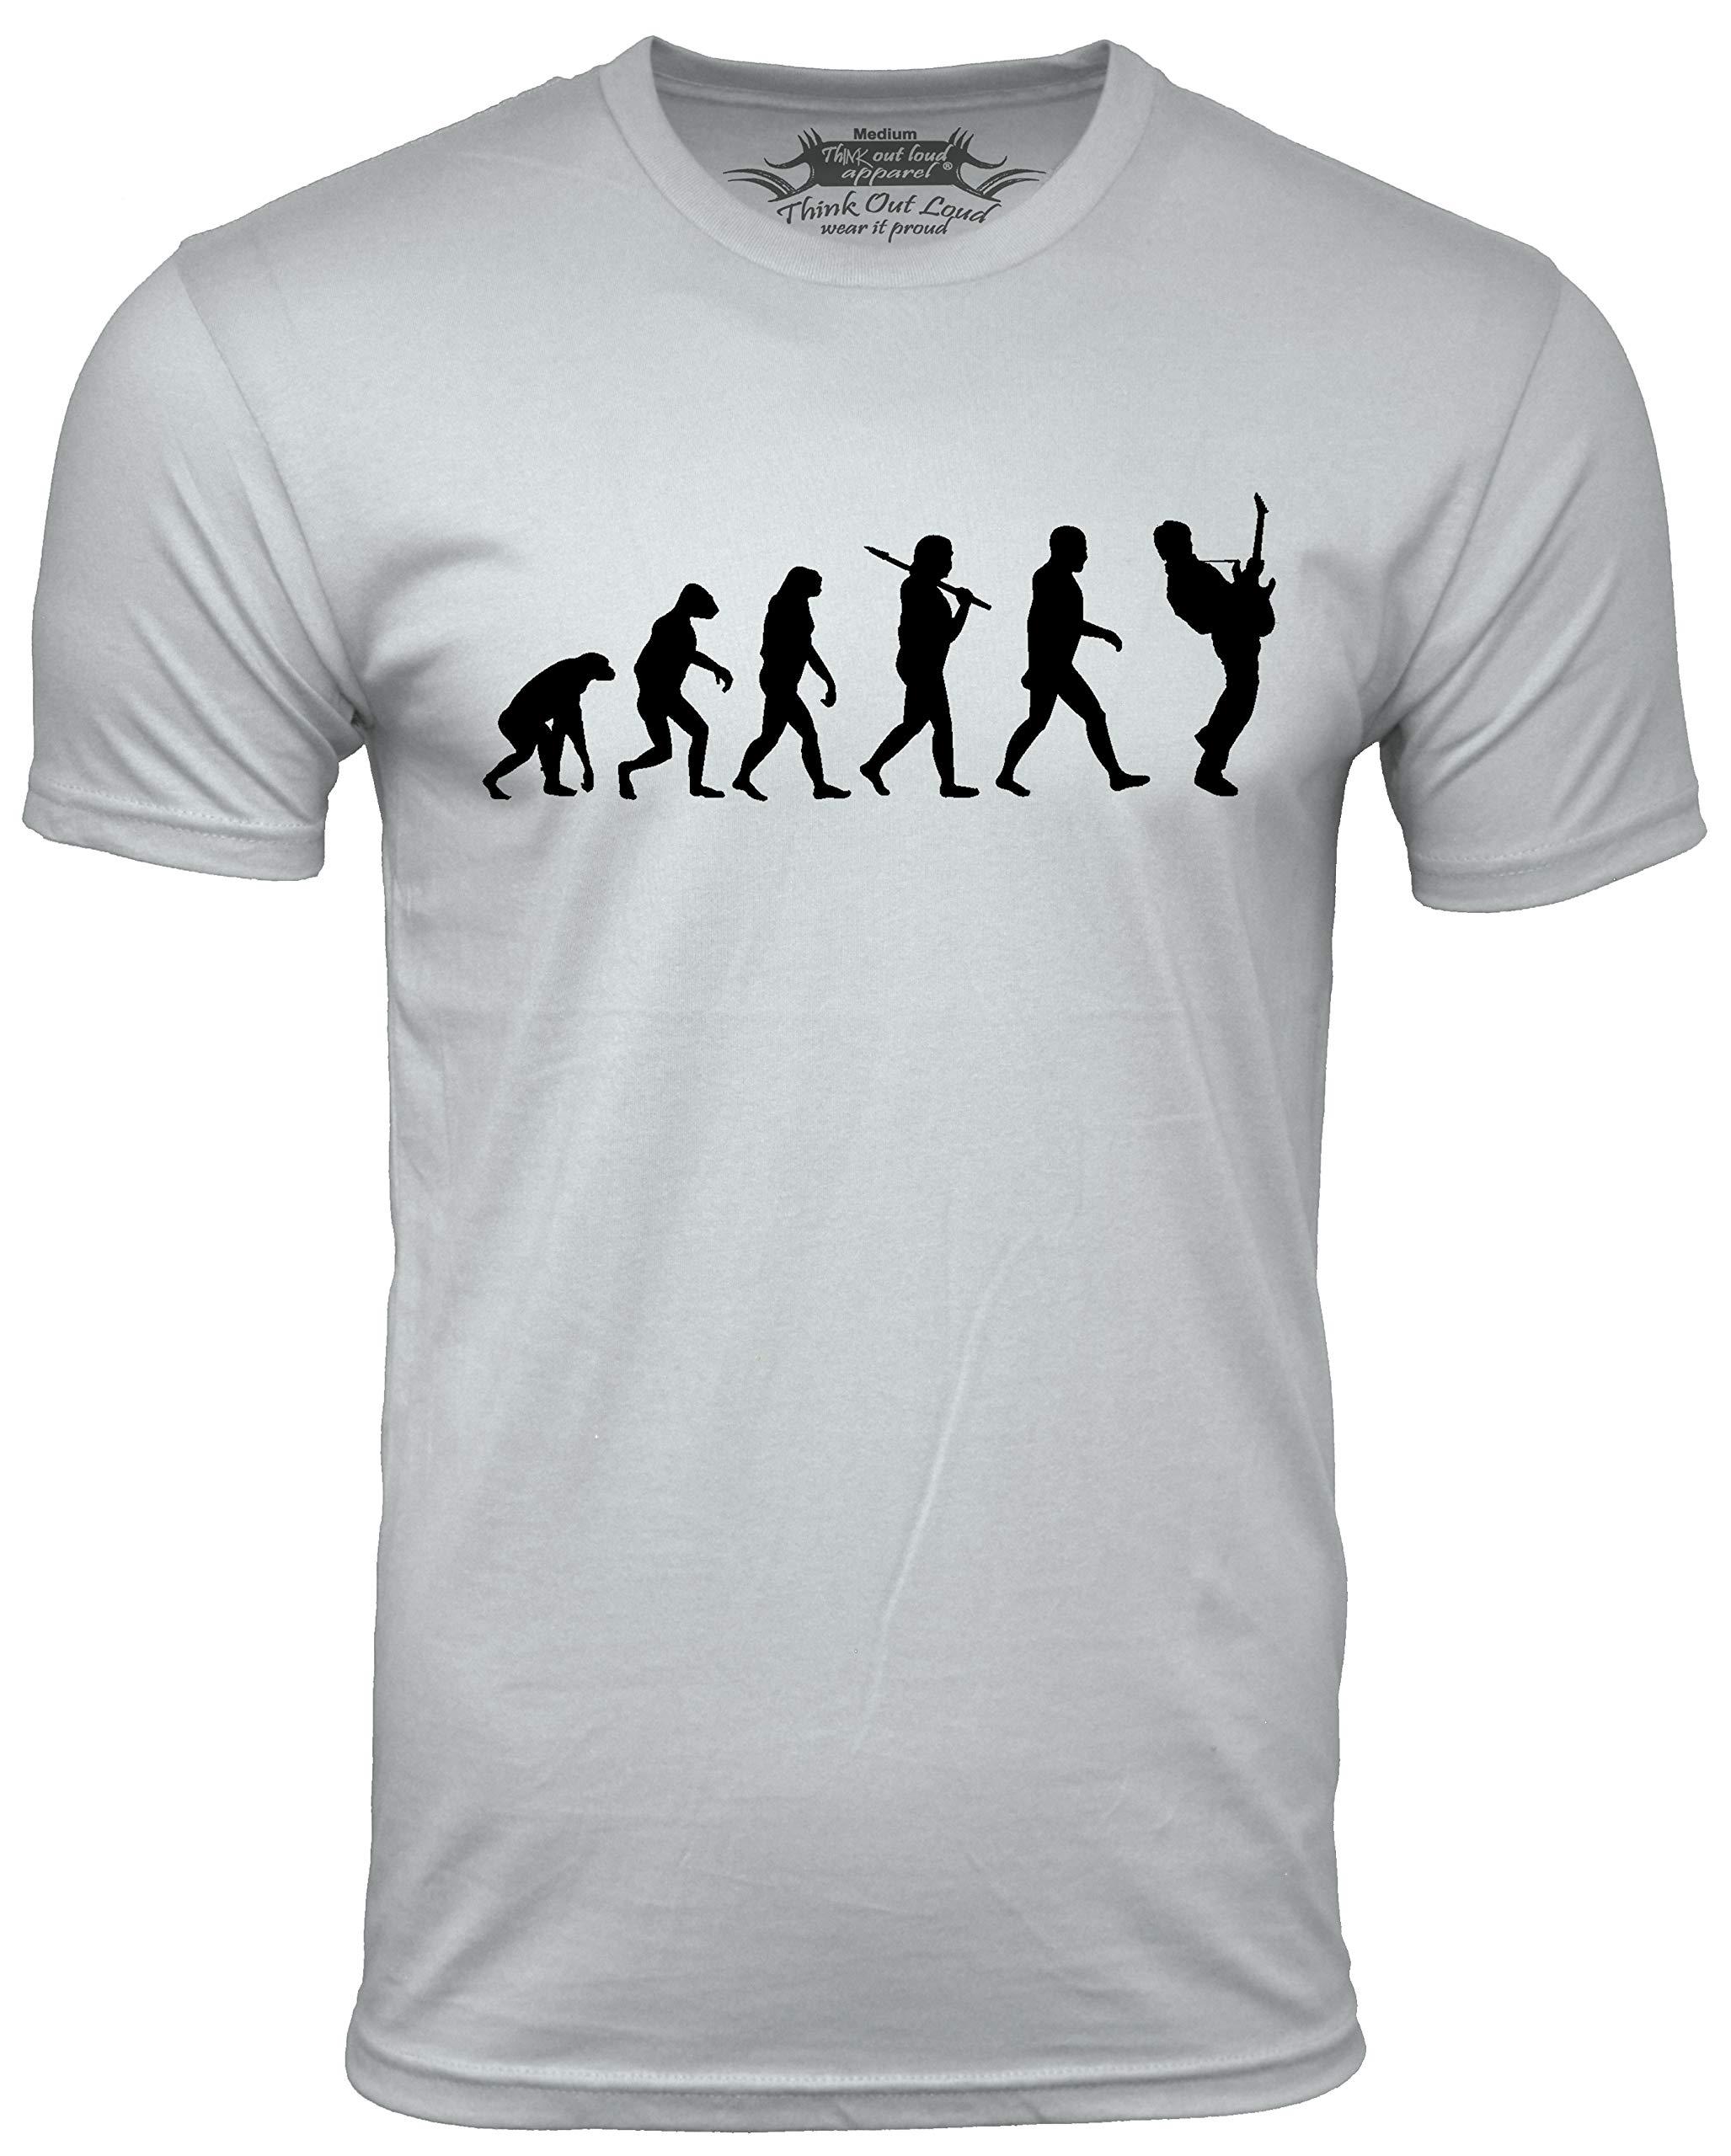 Think Out Loud Apparel Guitar Player Evolution Funny T-Shirt Guitarist Musician Tee T Shirt